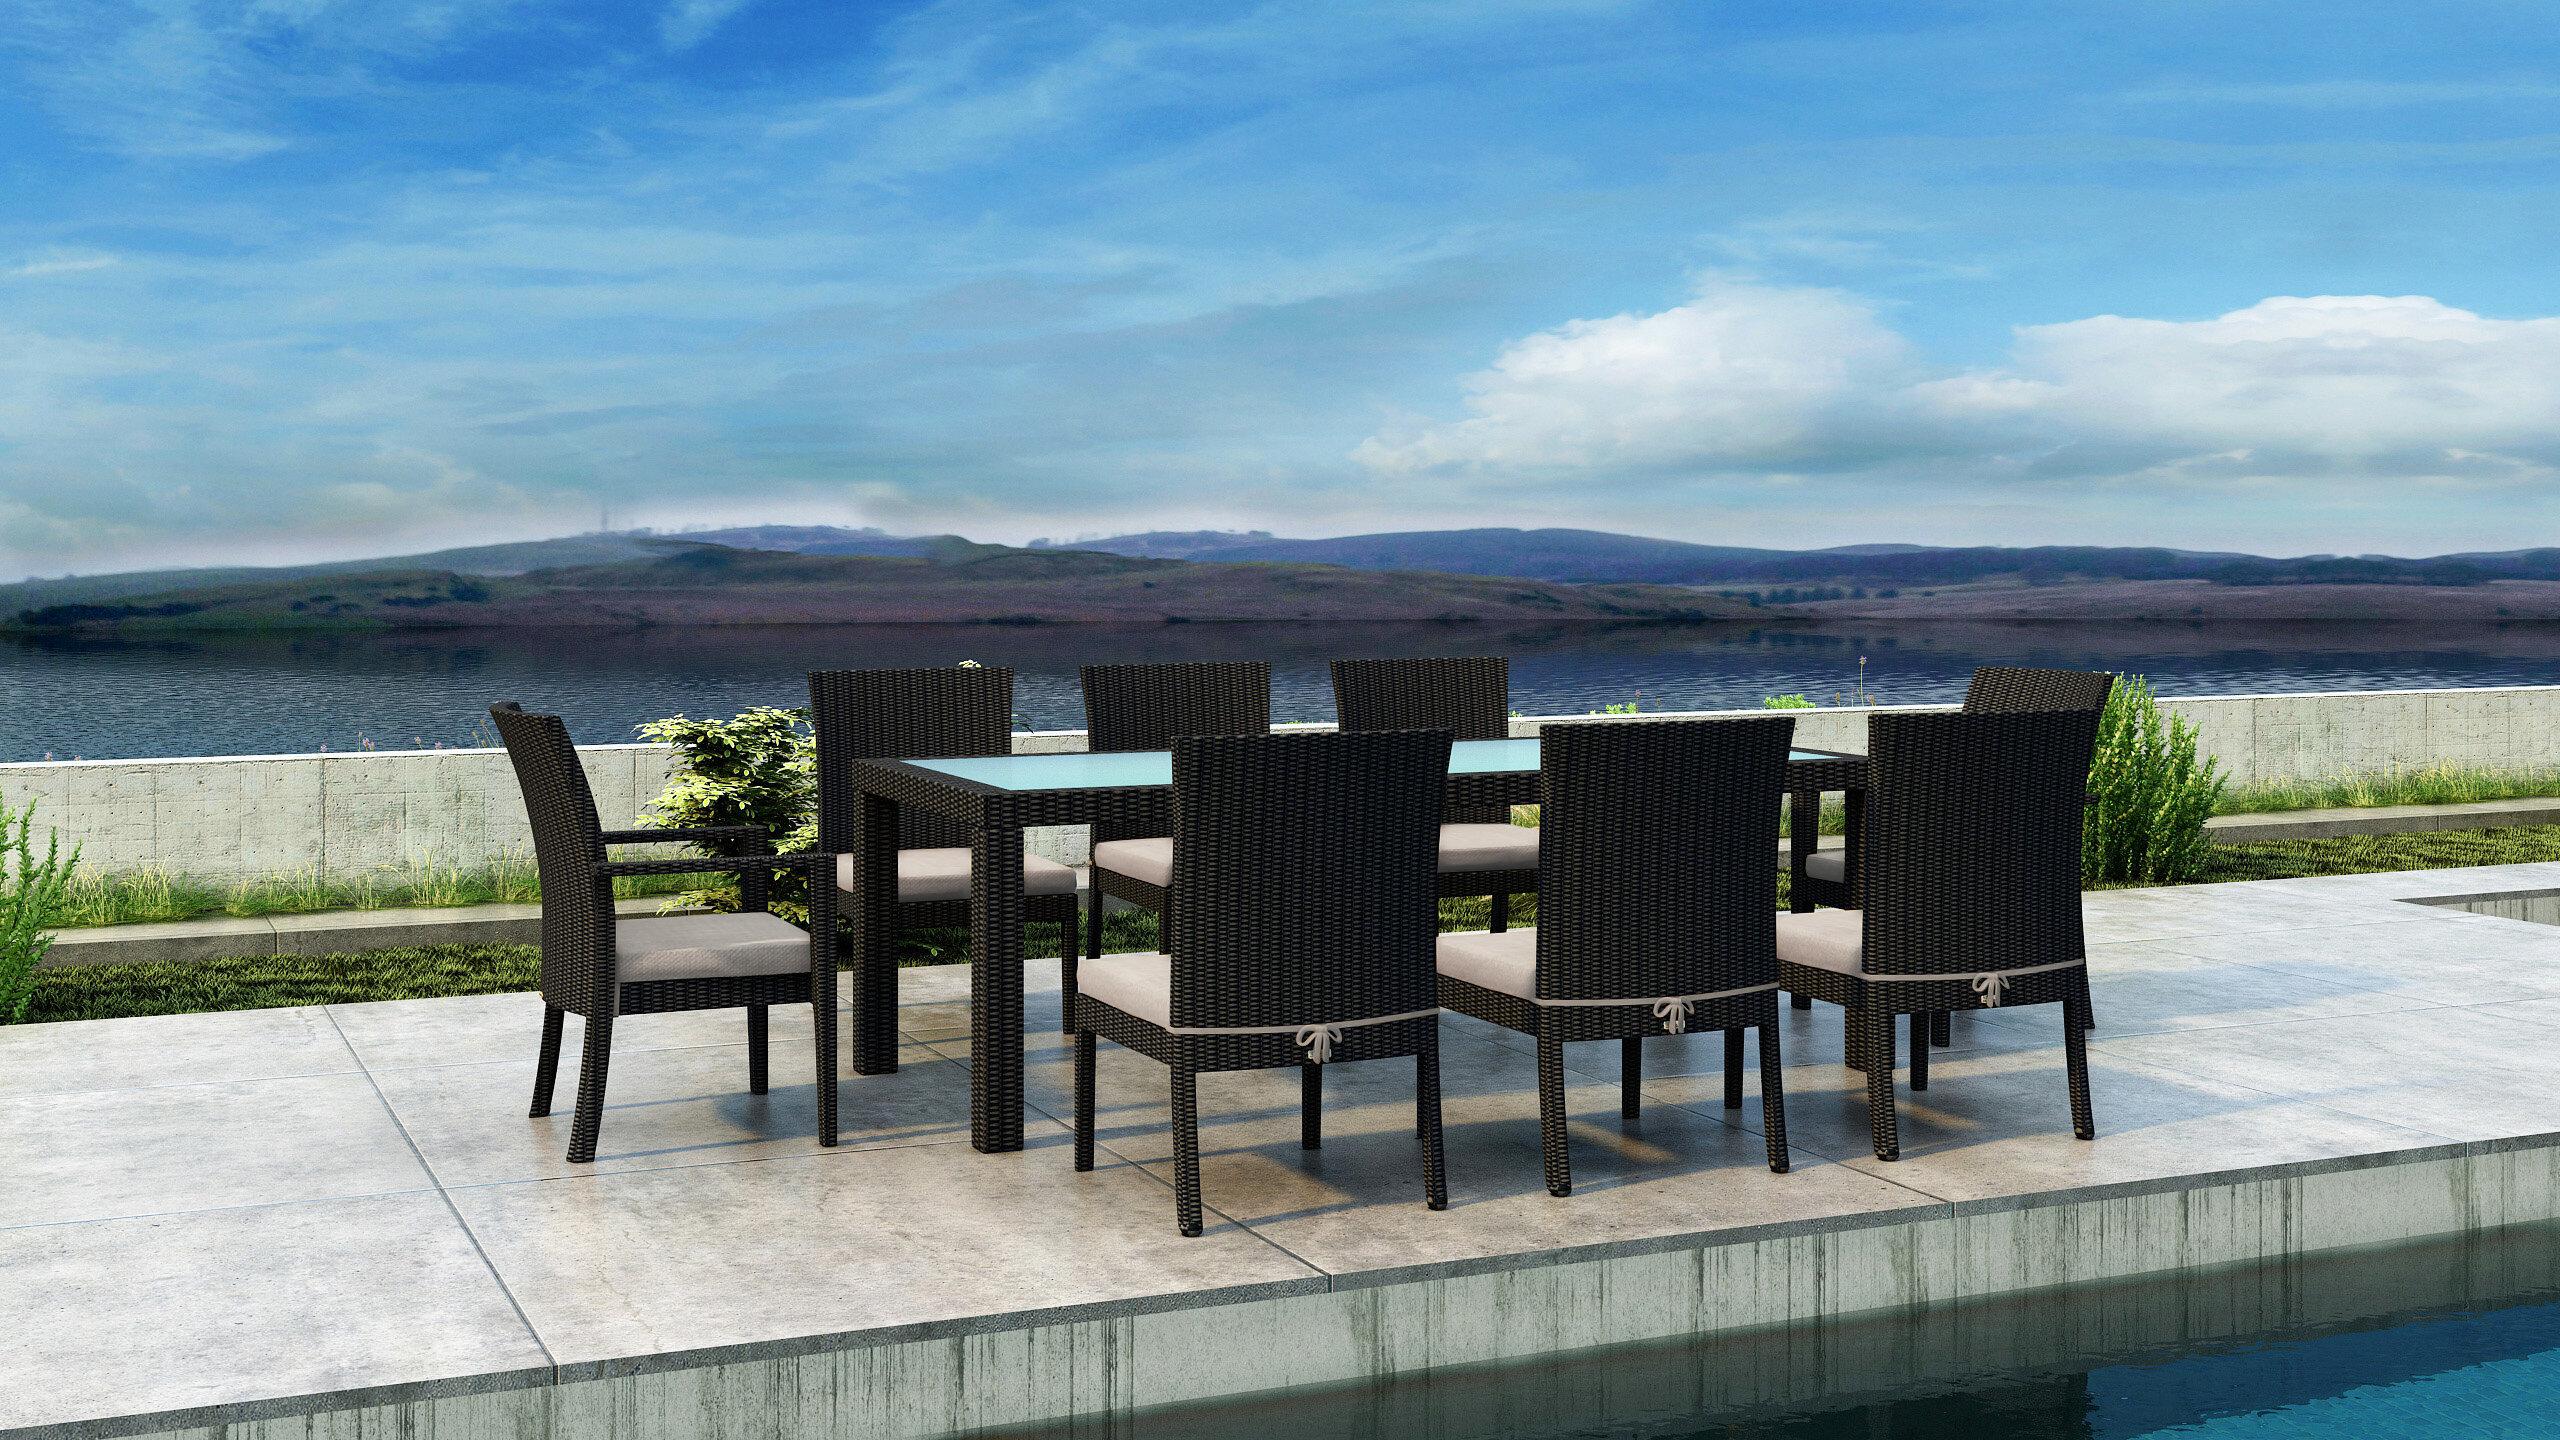 Everly quinn glendale 9 piece dining set with sunbrella cushion wayfair